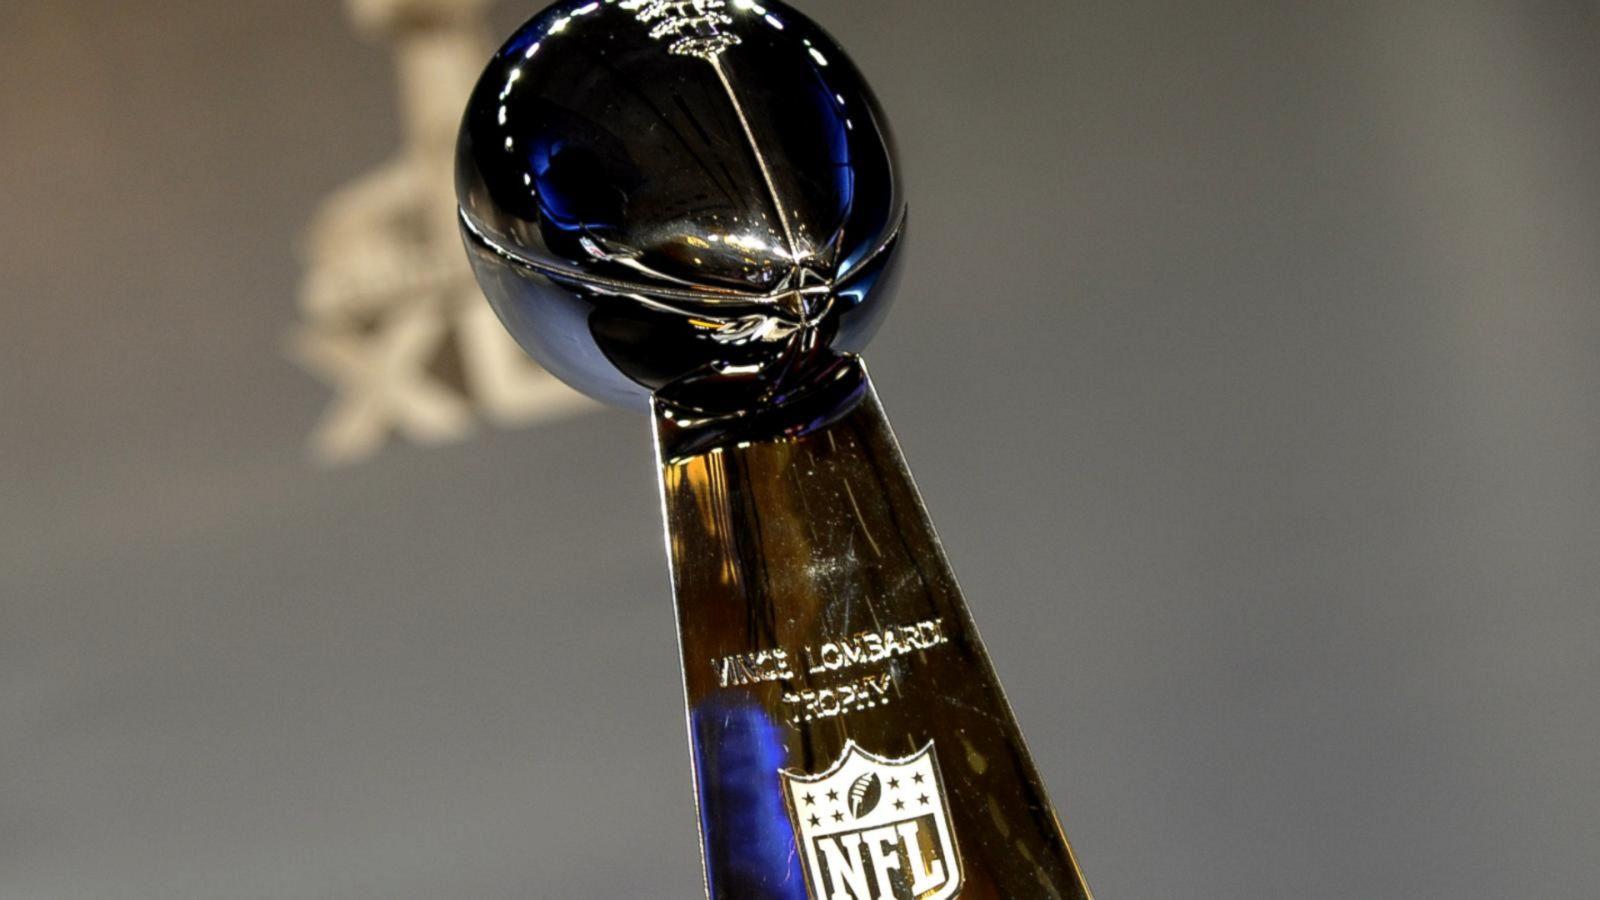 1c0728cb7c8bb Vince Lombardi Trophy: A Tiffany Piece Money Can't Buy - ABC News